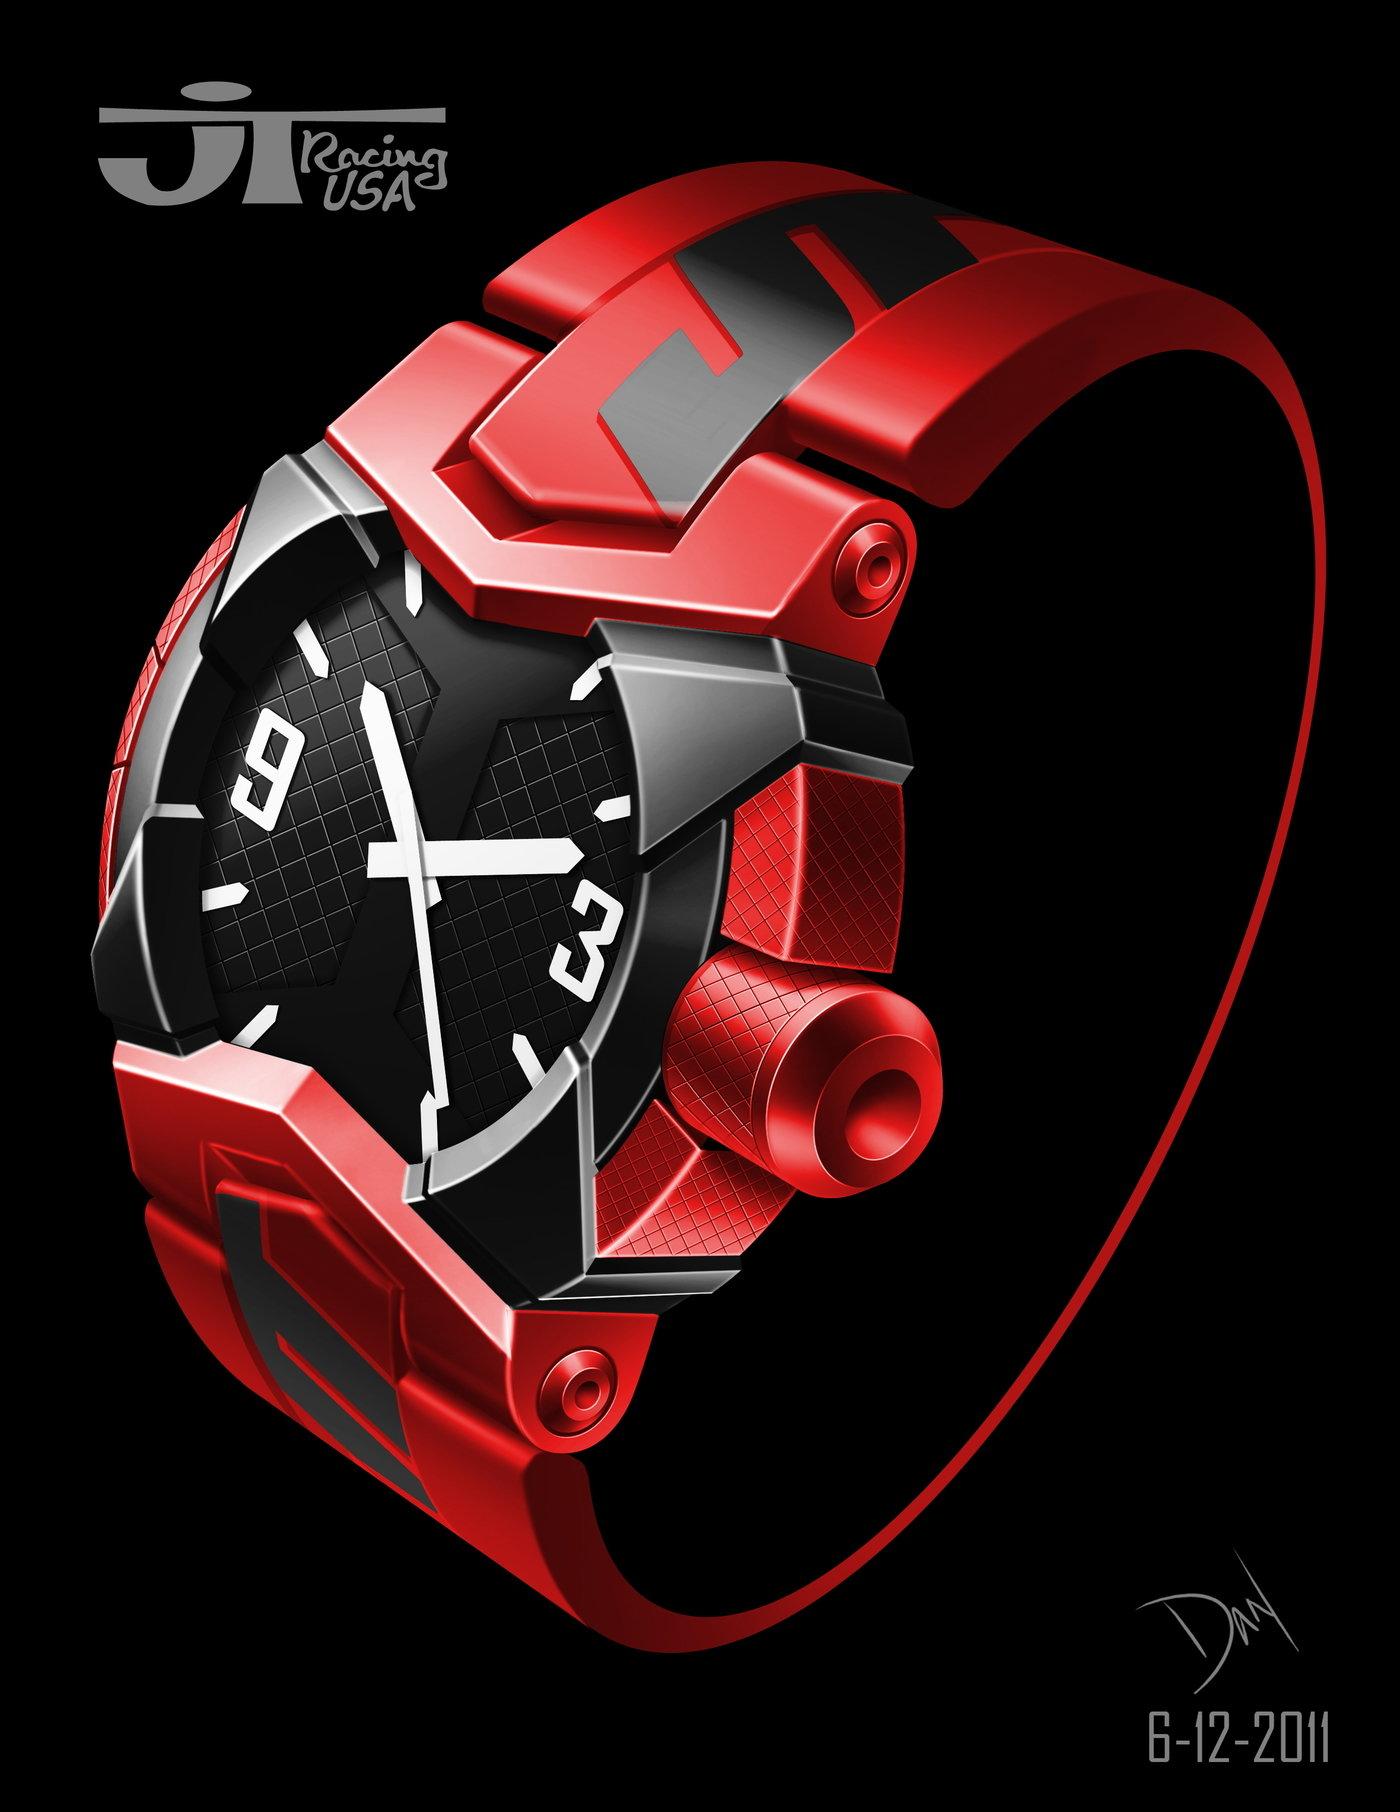 JT Racing Watch by Dan Winger at Coroflot com